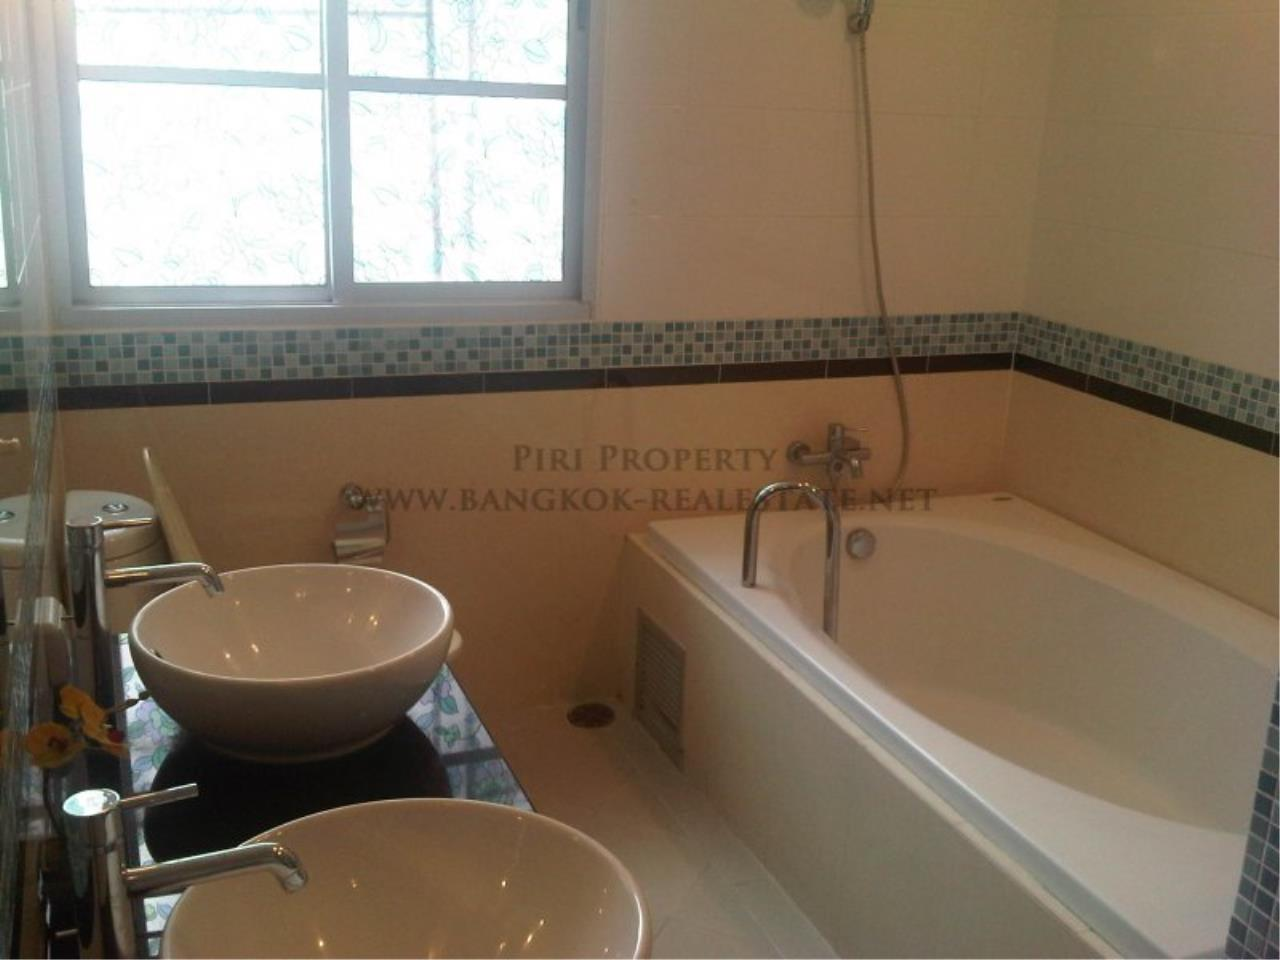 Piri Property Agency's 3 Bedroom Penthouse Unit - AP Citismart for Rent 6